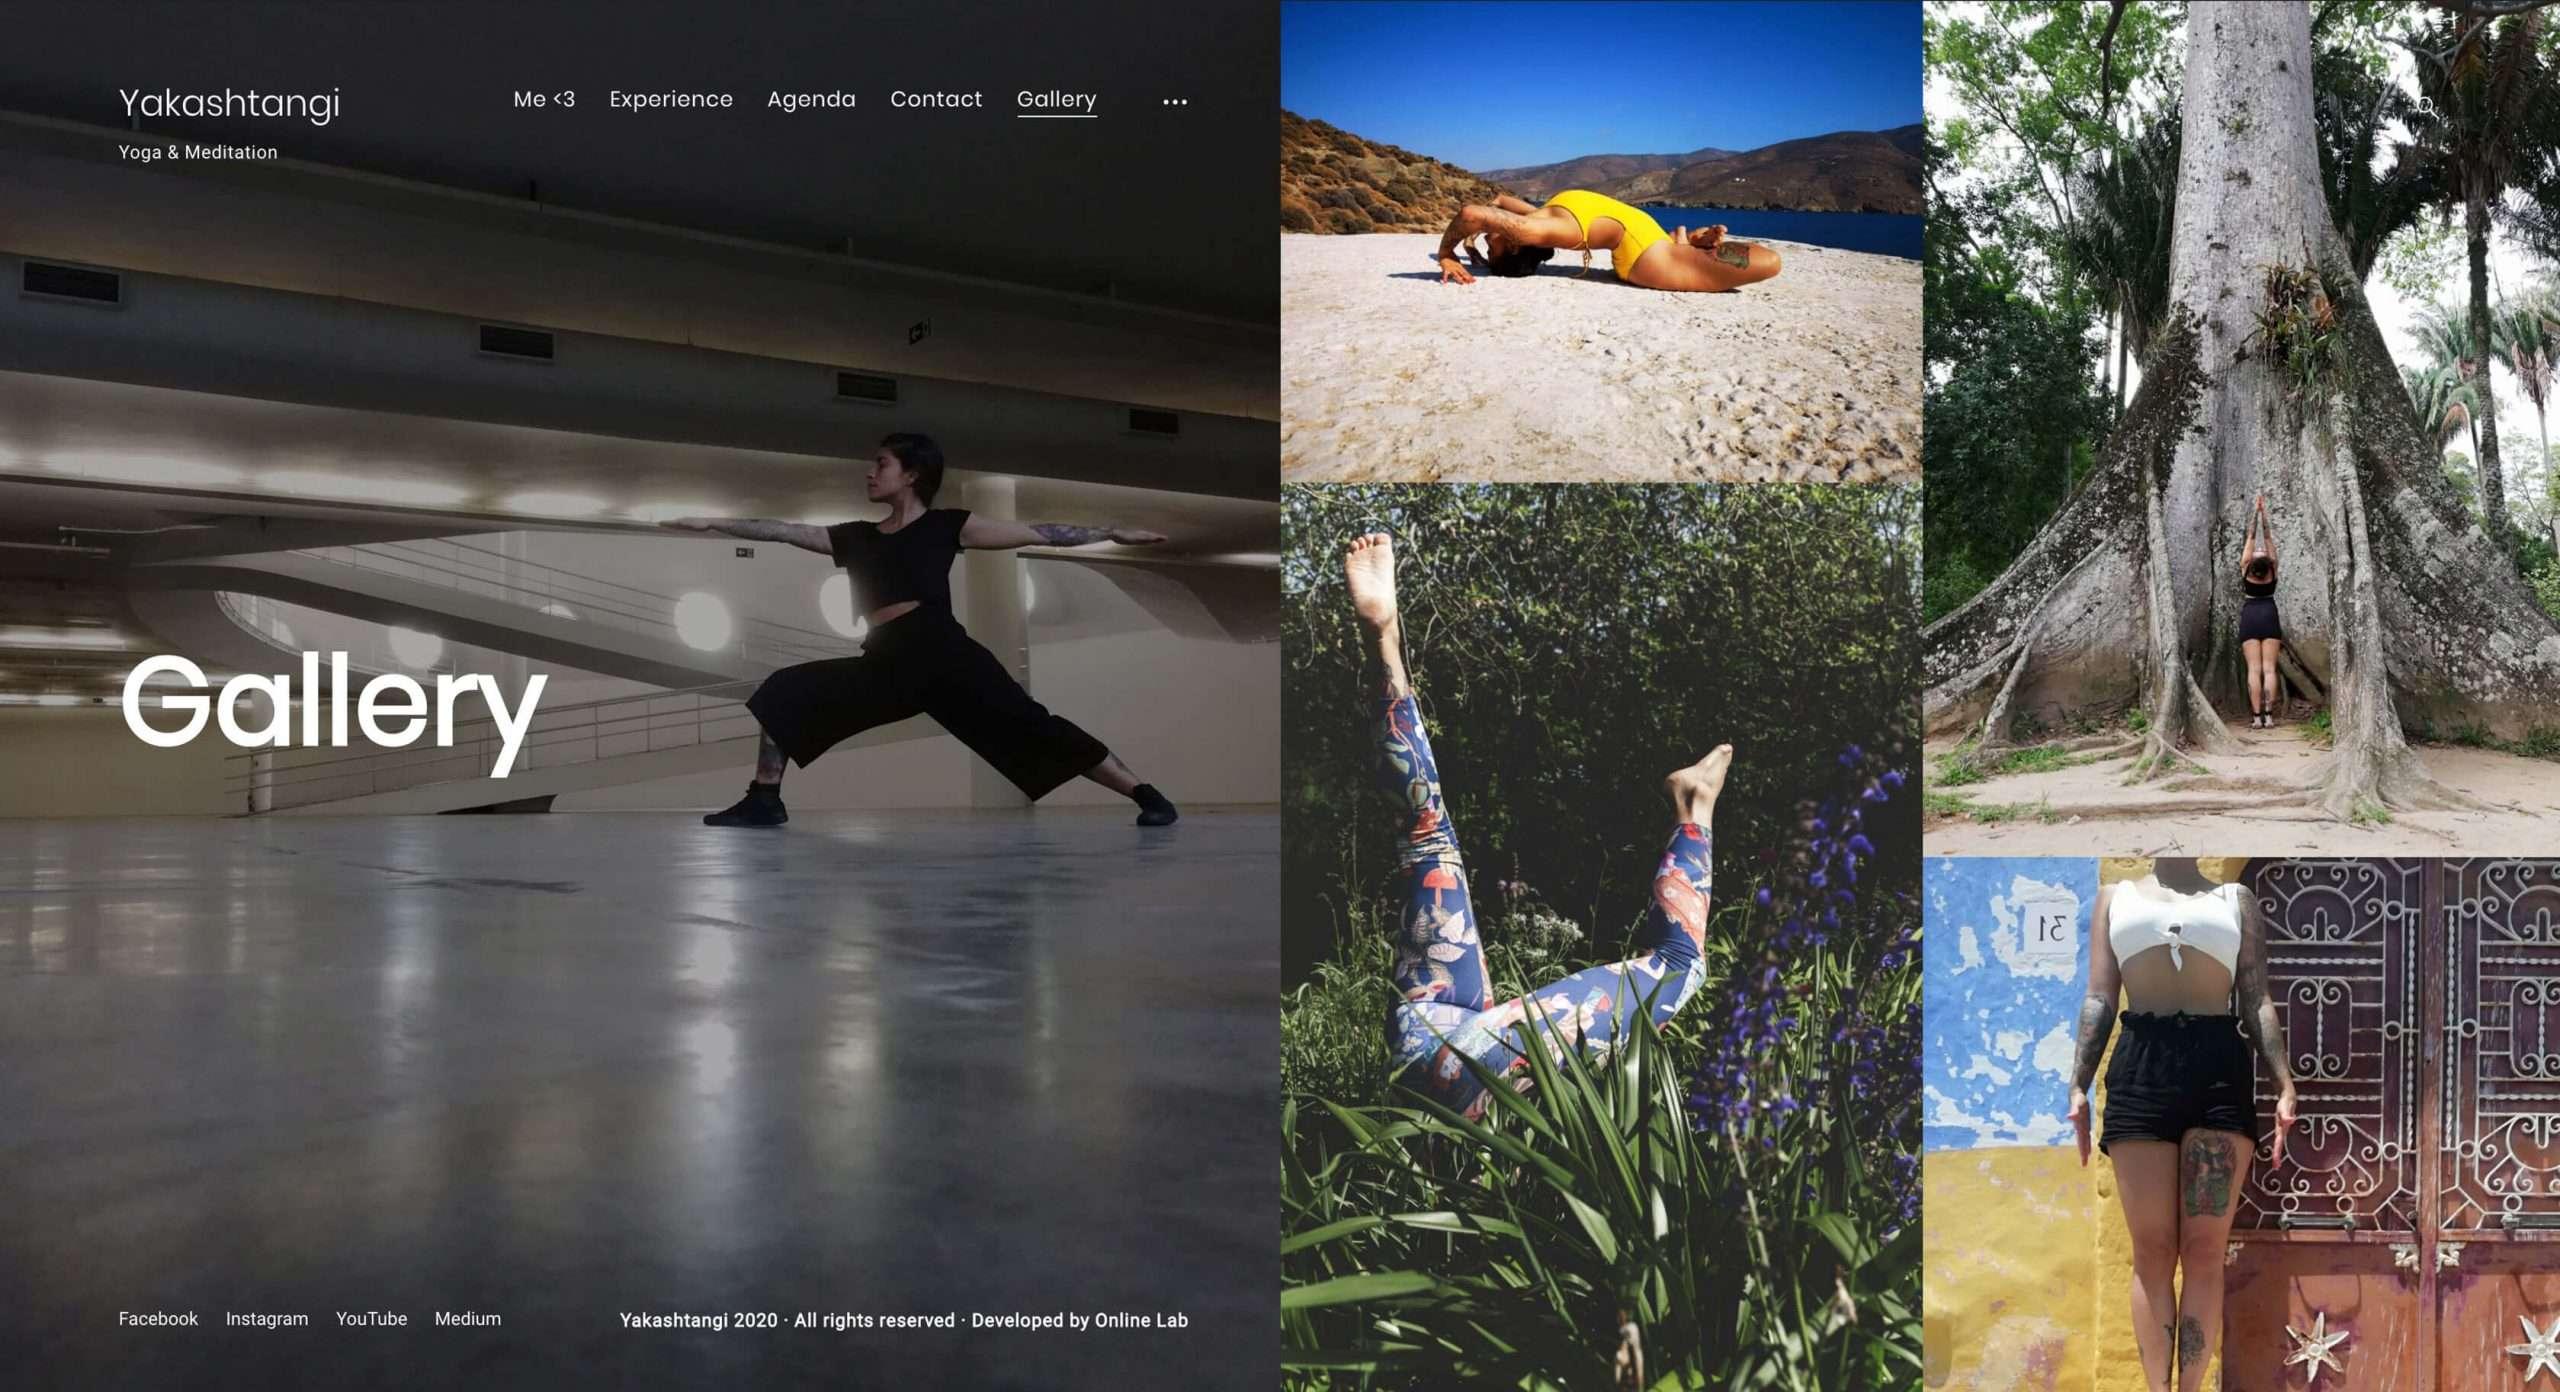 yakashtangi-yoga-meditation-berlin-online-lab-lisbon-web-development-web-design-5